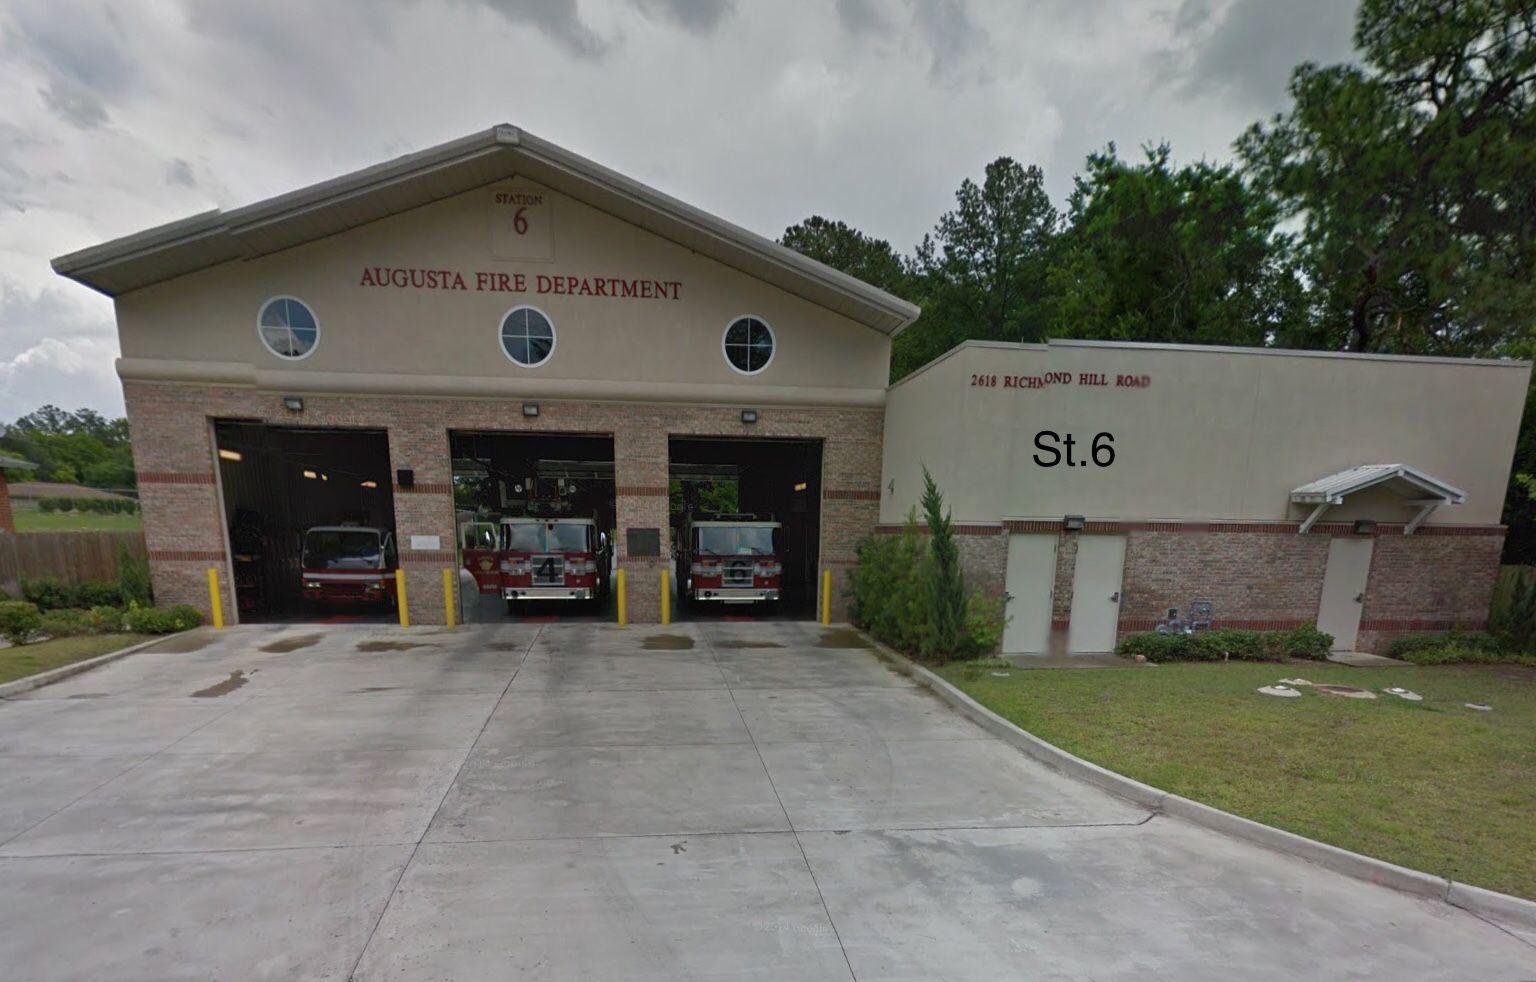 Outdoor Decor By Jaden Conner On Augusta Fd Decor Fire Department